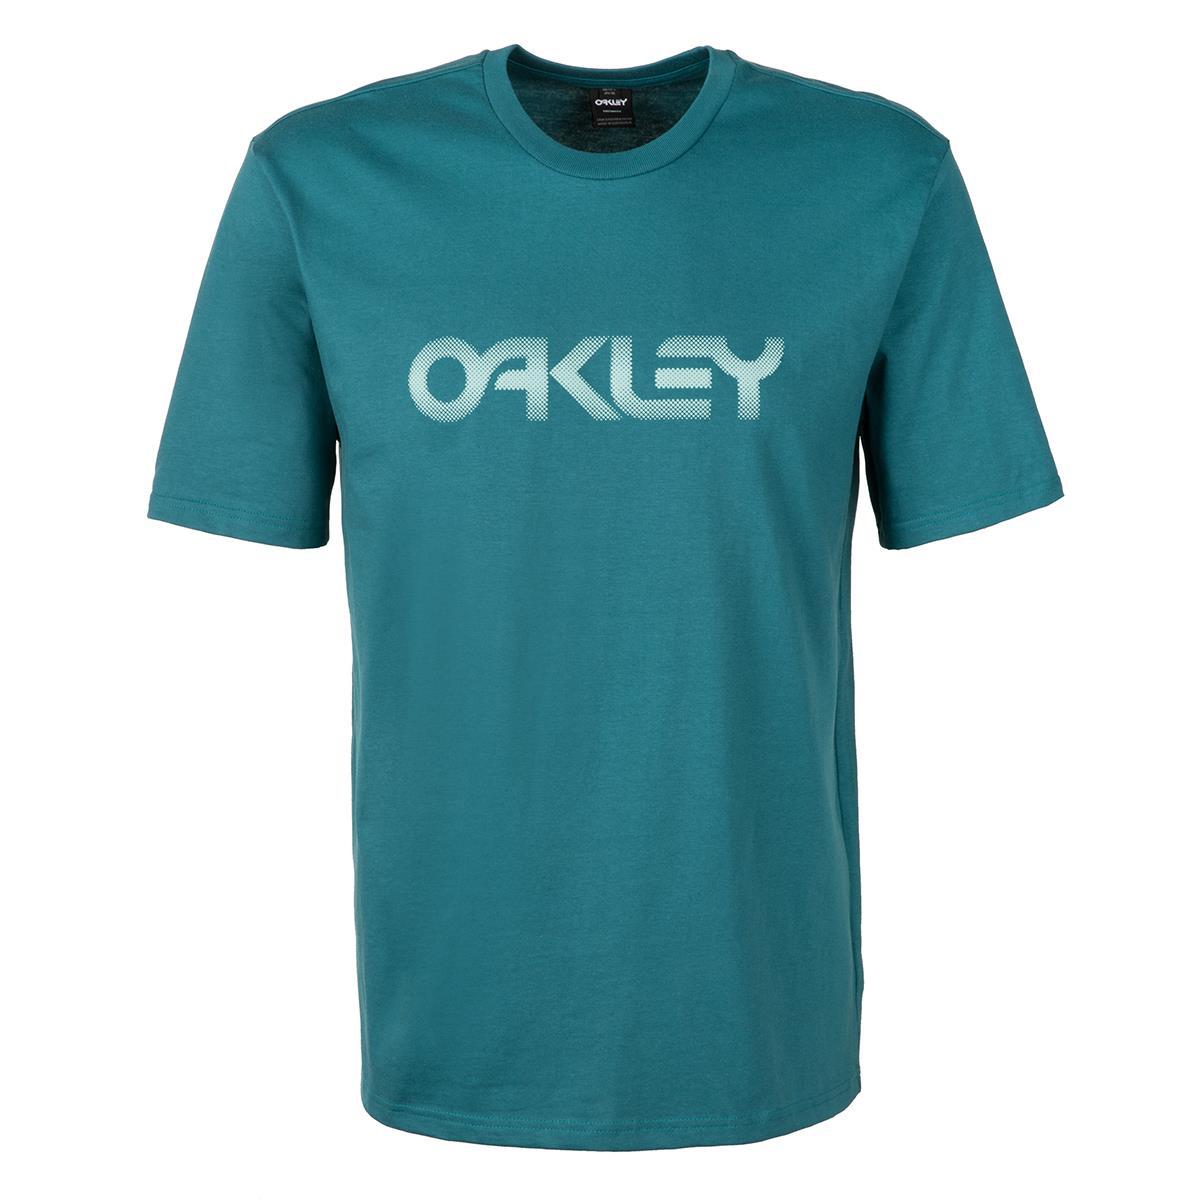 Oakley T-Shirt  Petrol